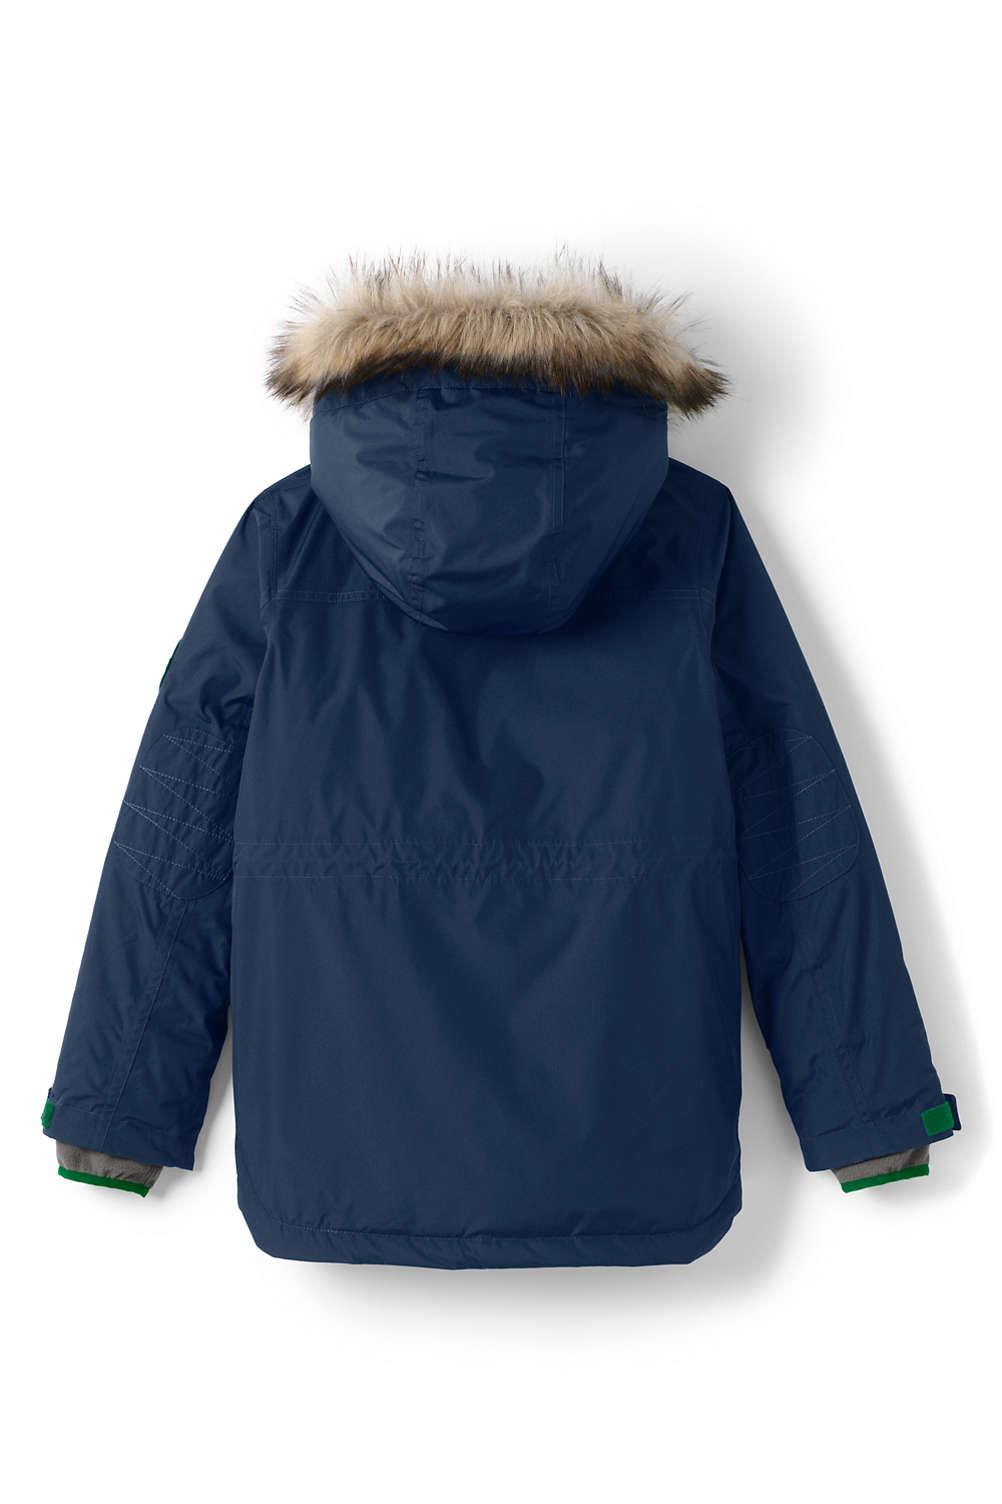 Old Navy Baby Boy Winter Hats 06912c7c67ff